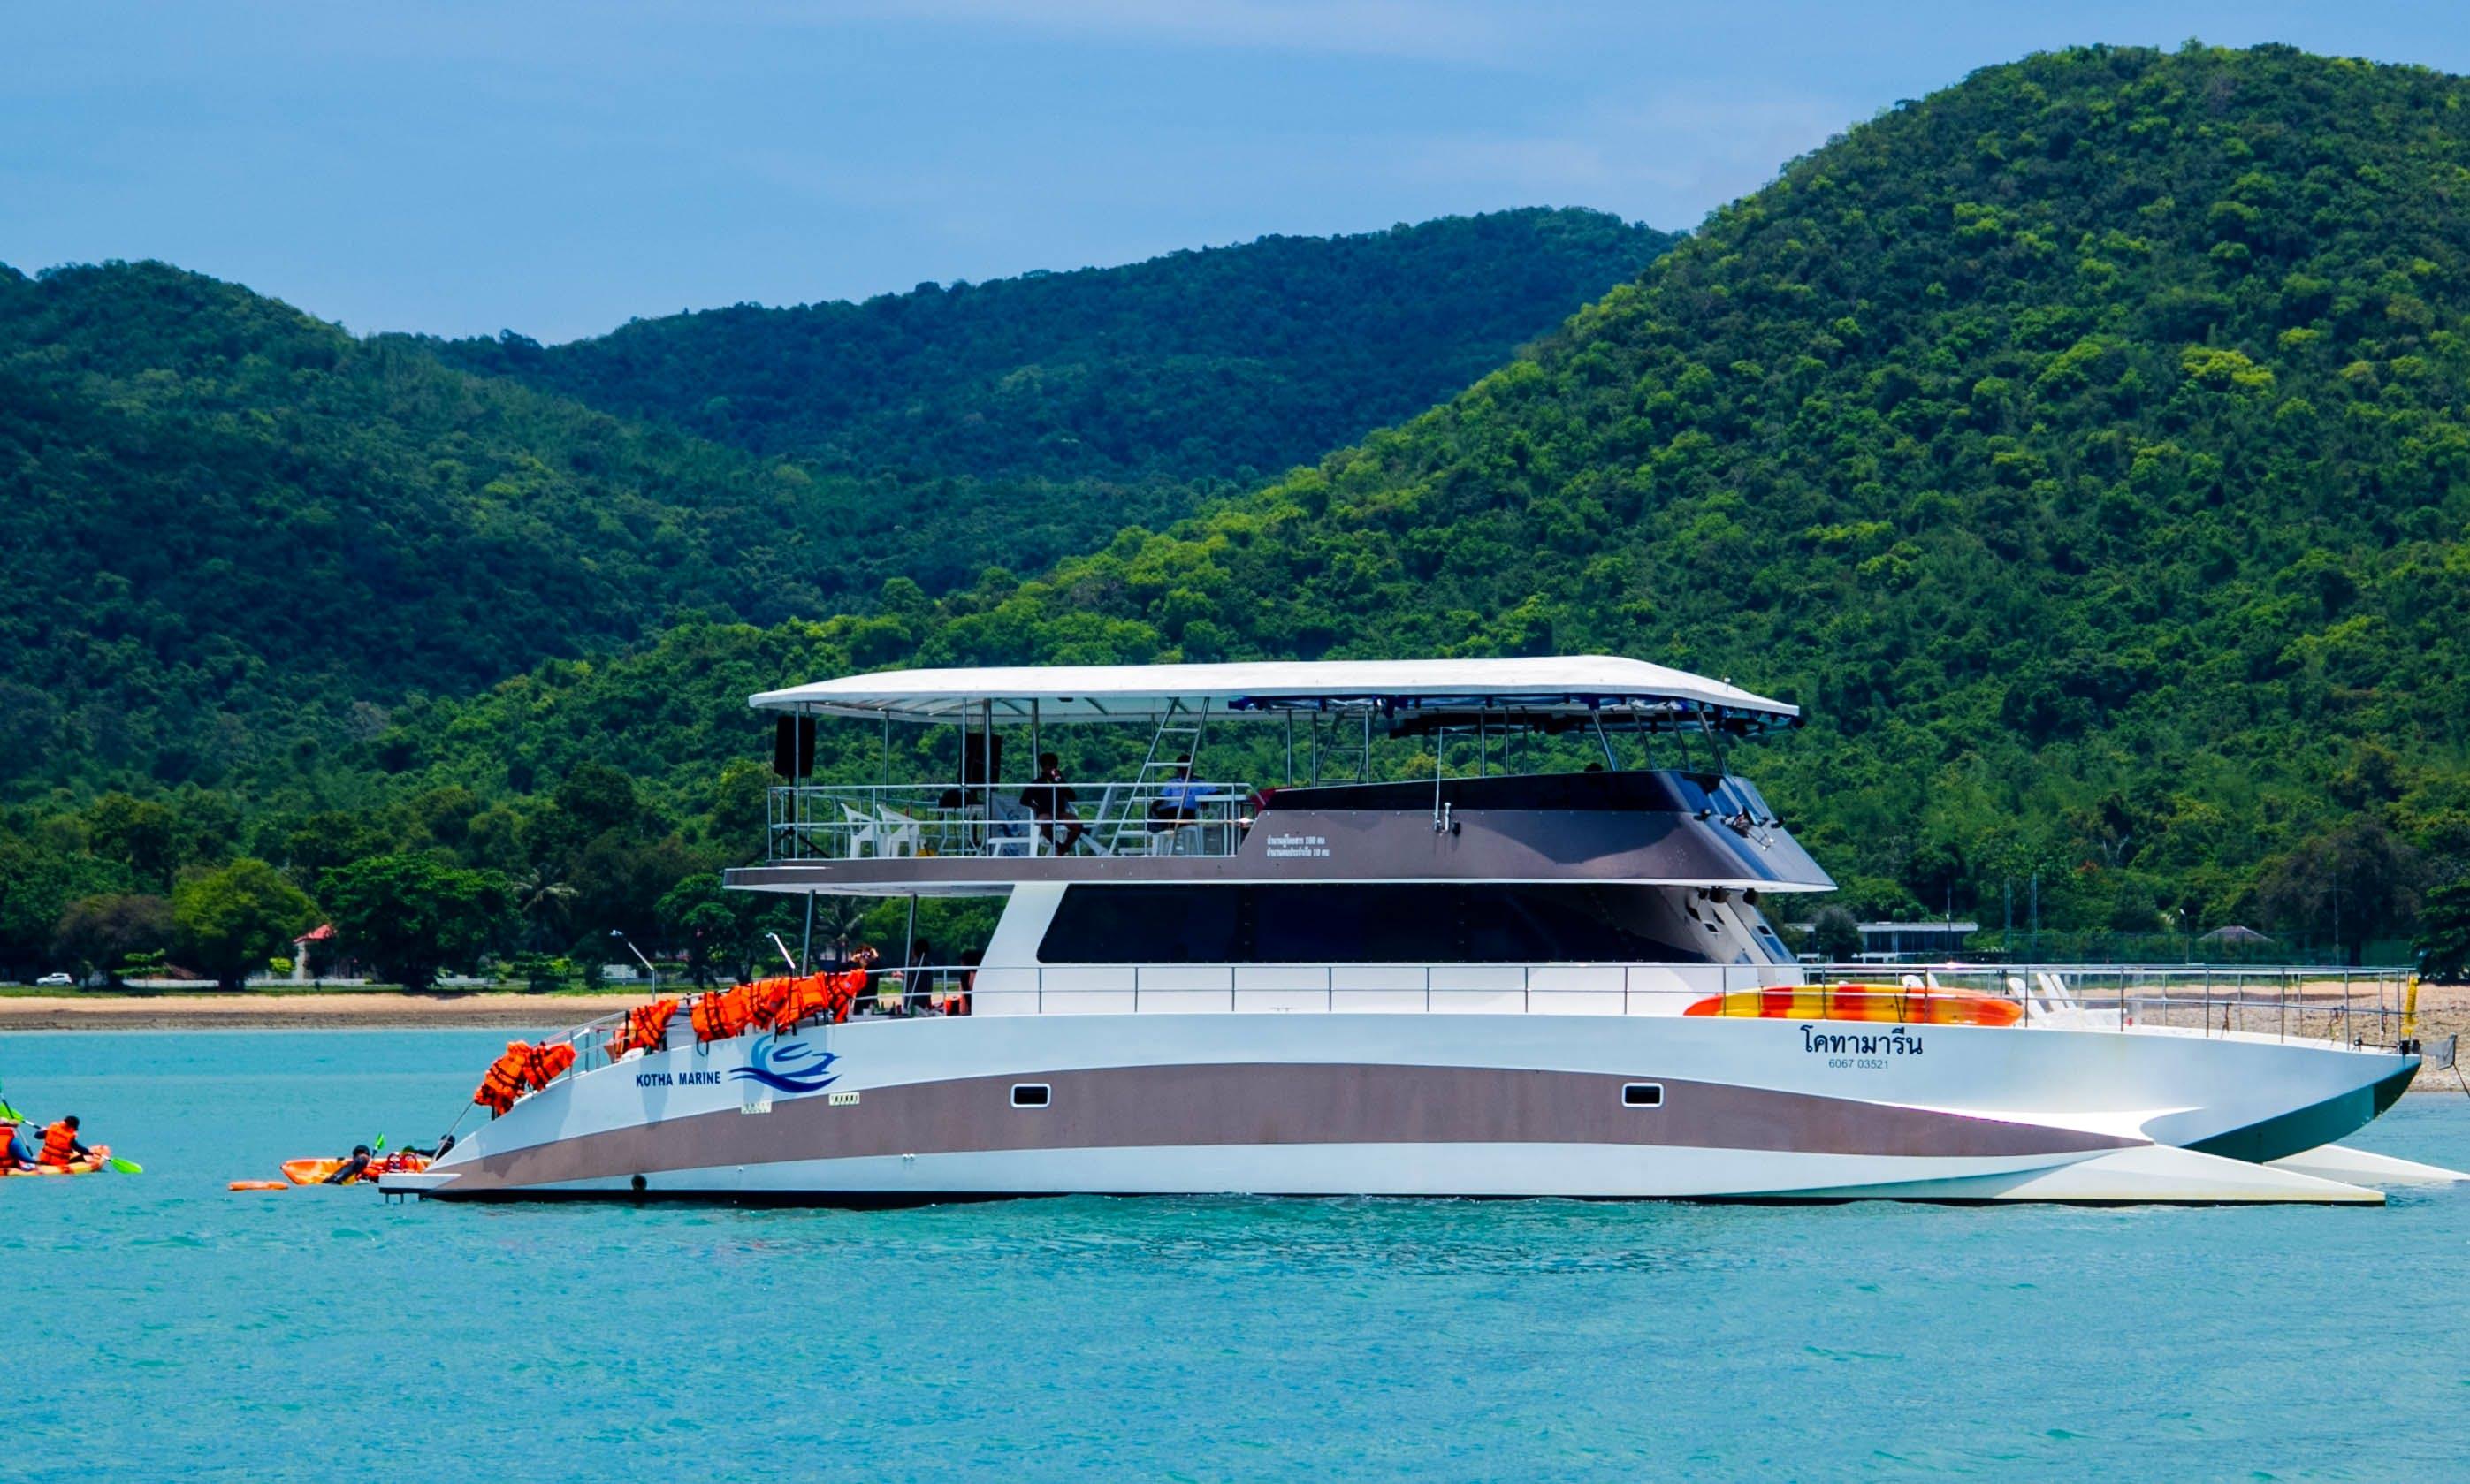 Power Catamaran KTM74 - Best Party Boat in Pattaya